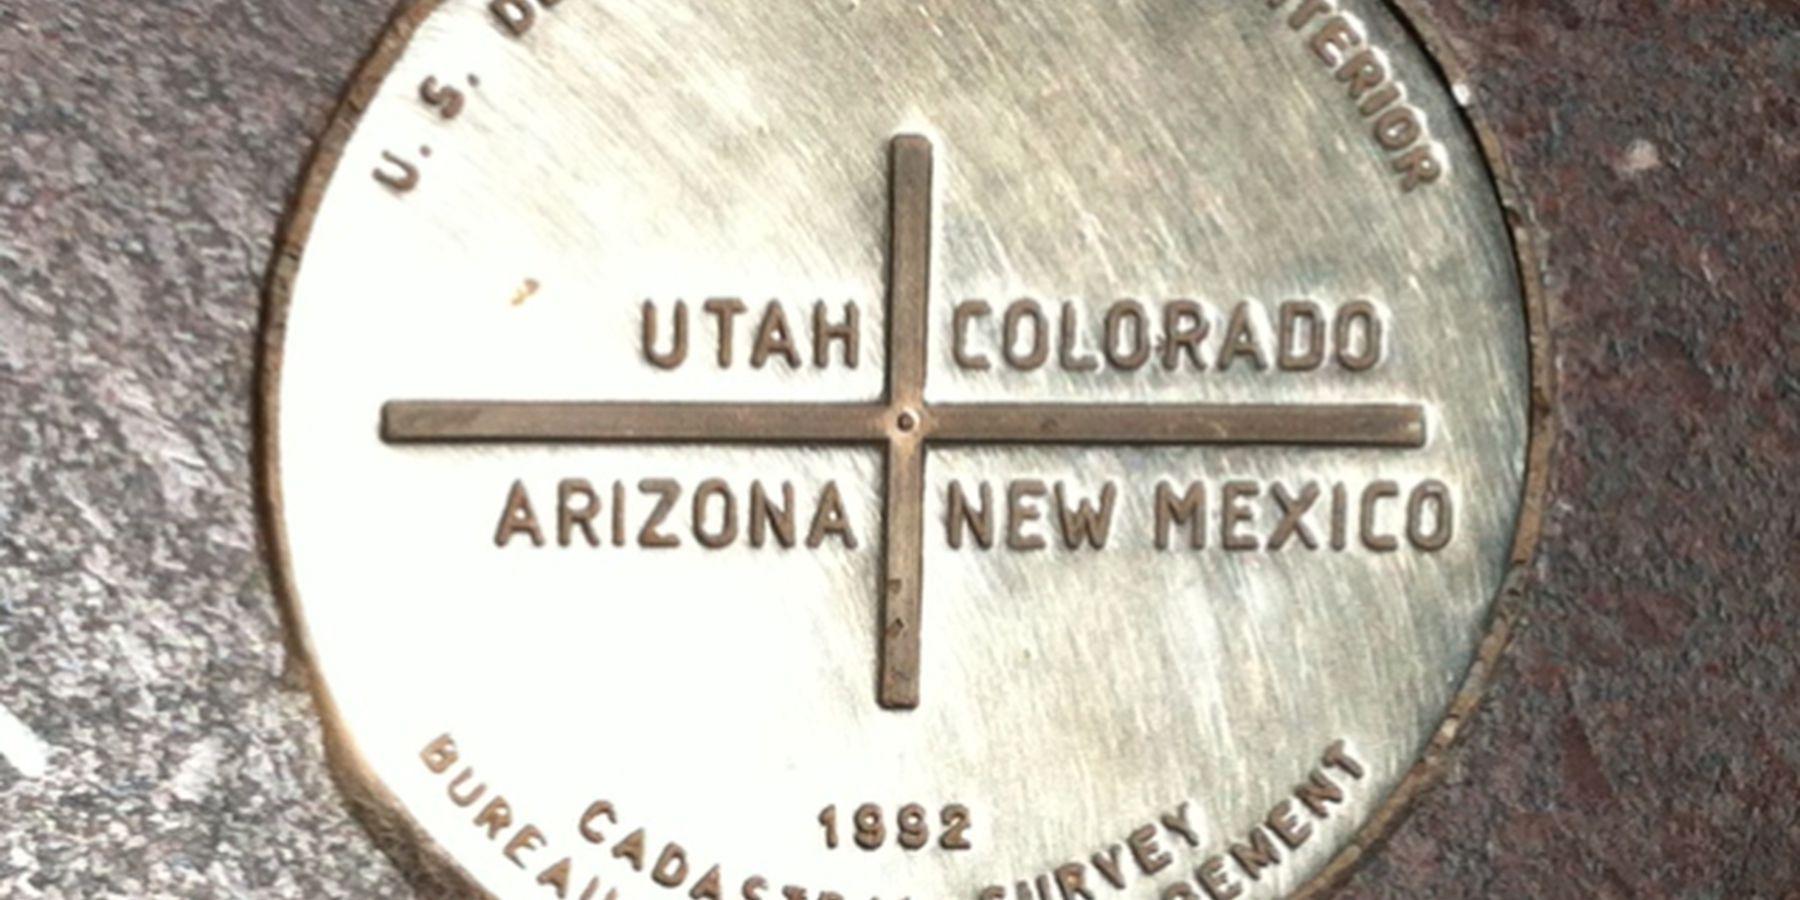 Four Corners Monument - Arizona -  Doets Reizen